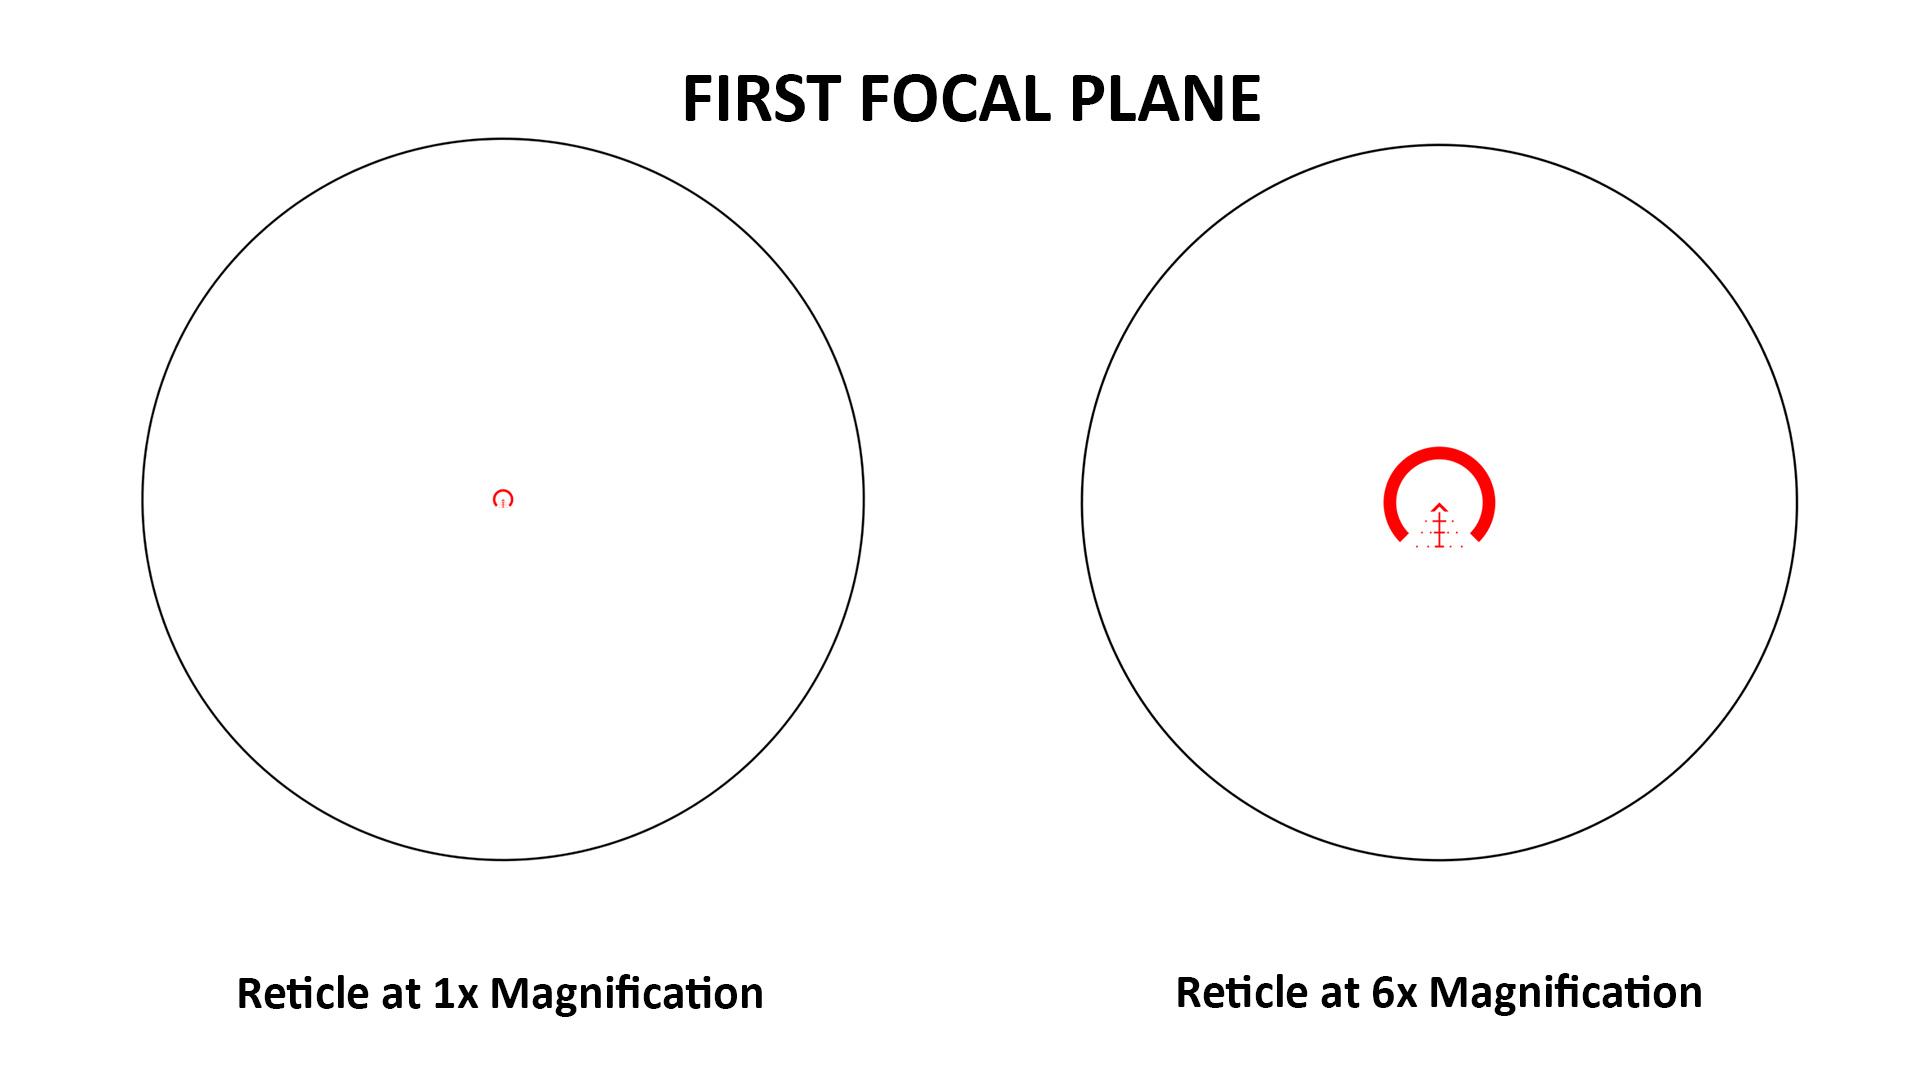 Raptor Takes Flight 1 6x24 First Focal Plane 399 Lifetime Warranty Page 1 Ar15 Com